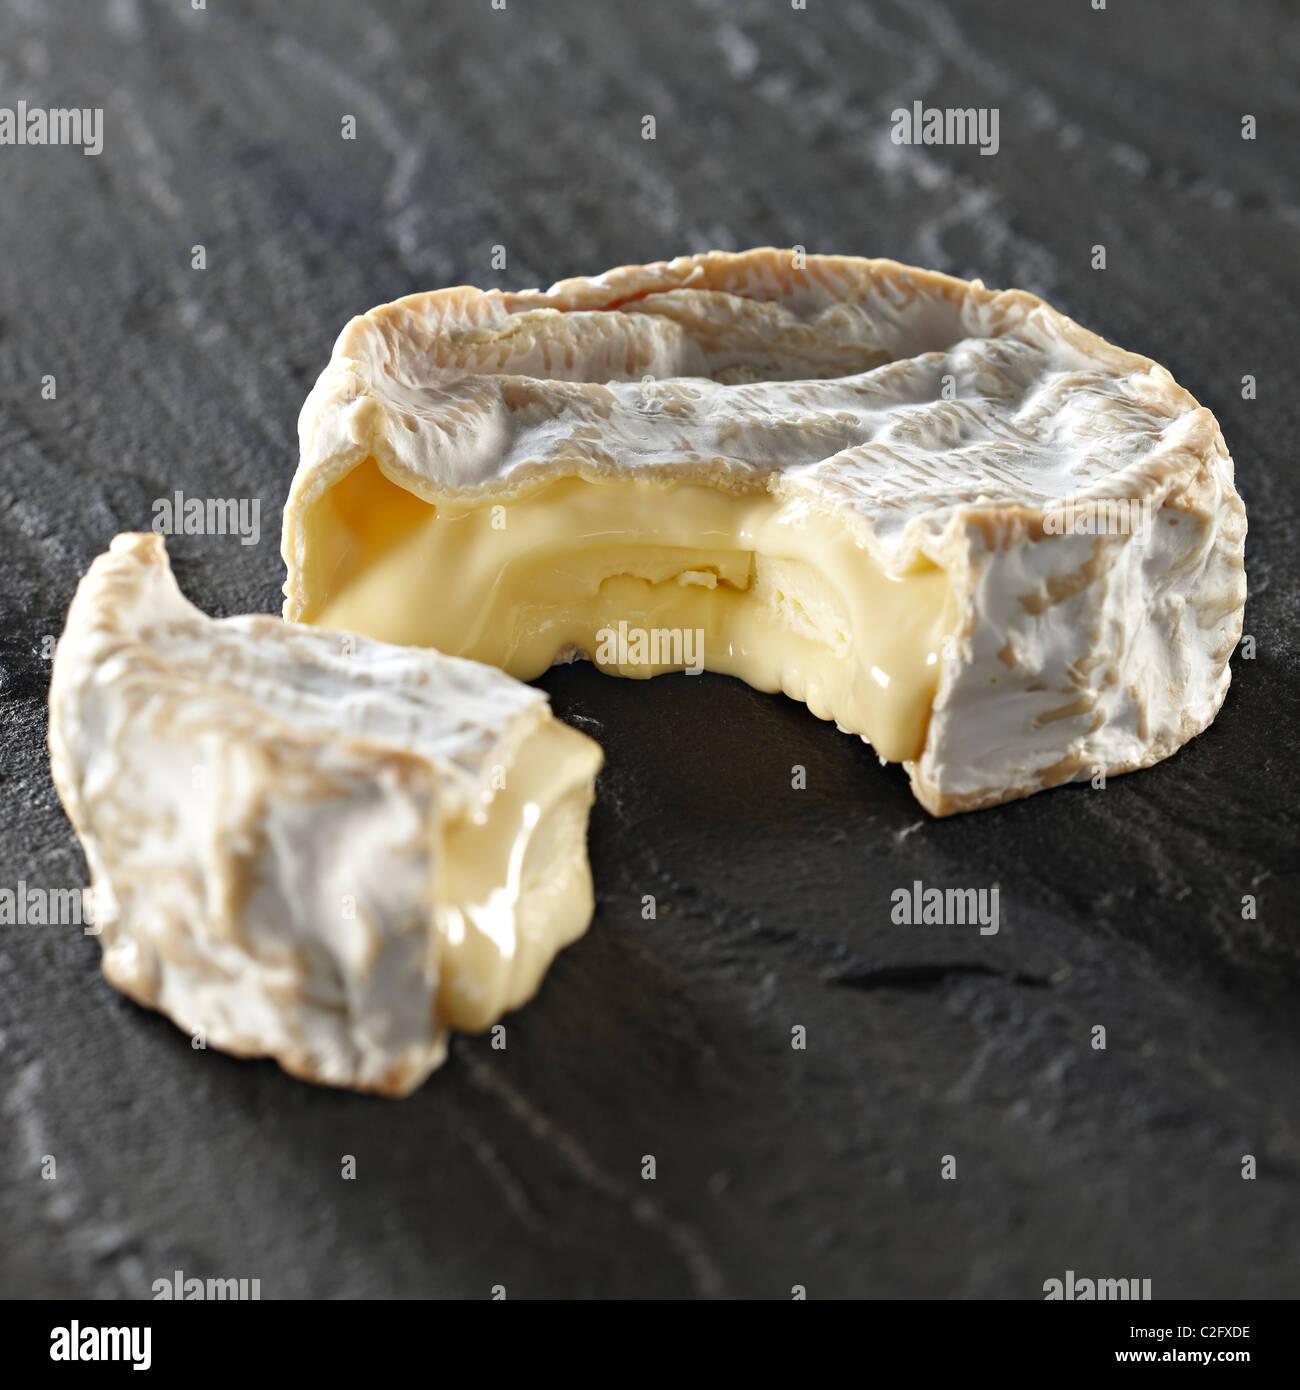 St Eadburgha cheese - Stock Image